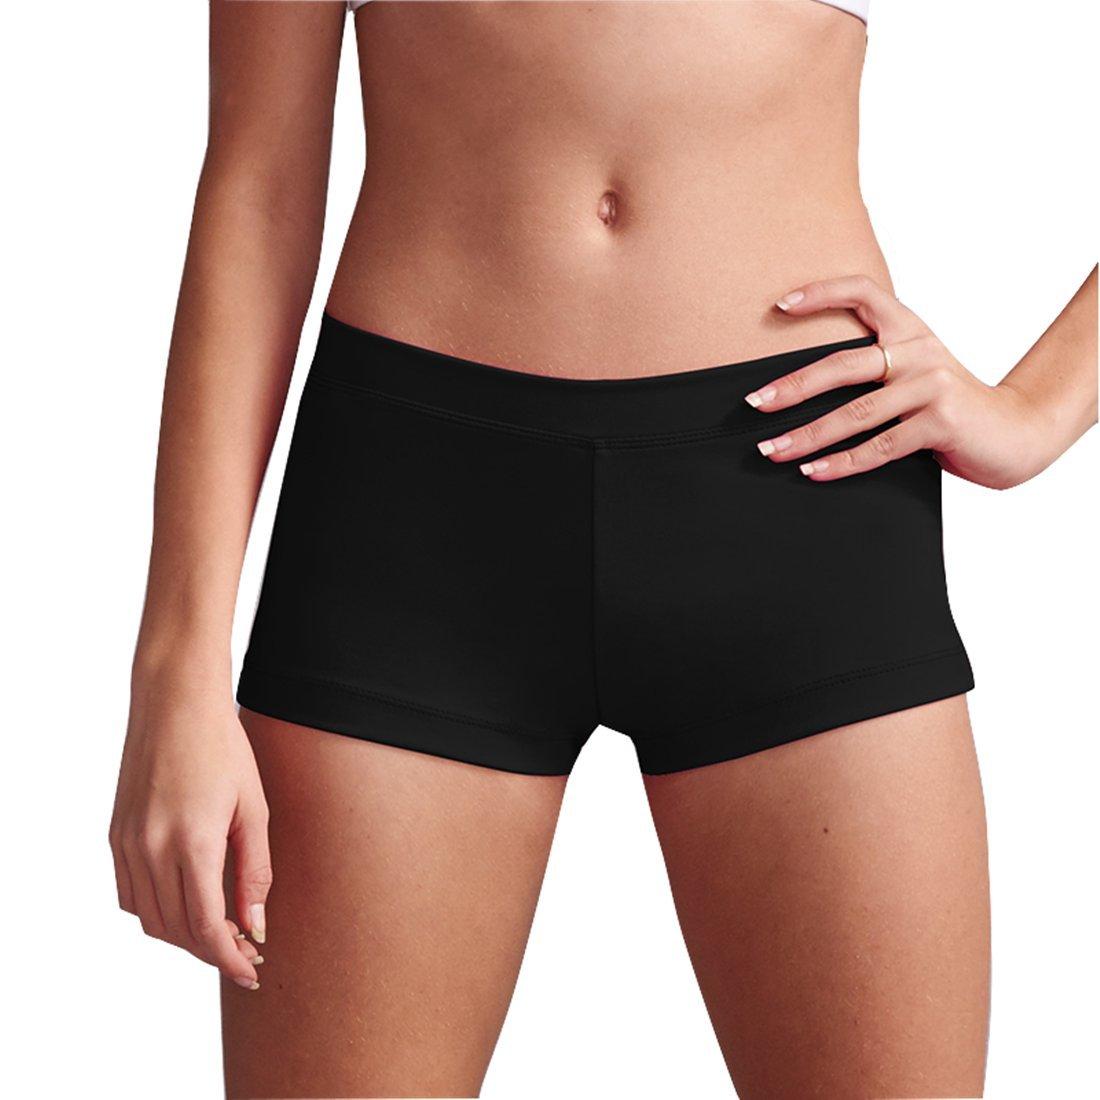 Girls Dance short - Girls' Boy Cut Low Rise Gymnastics Shorts (130(7-8)),Black